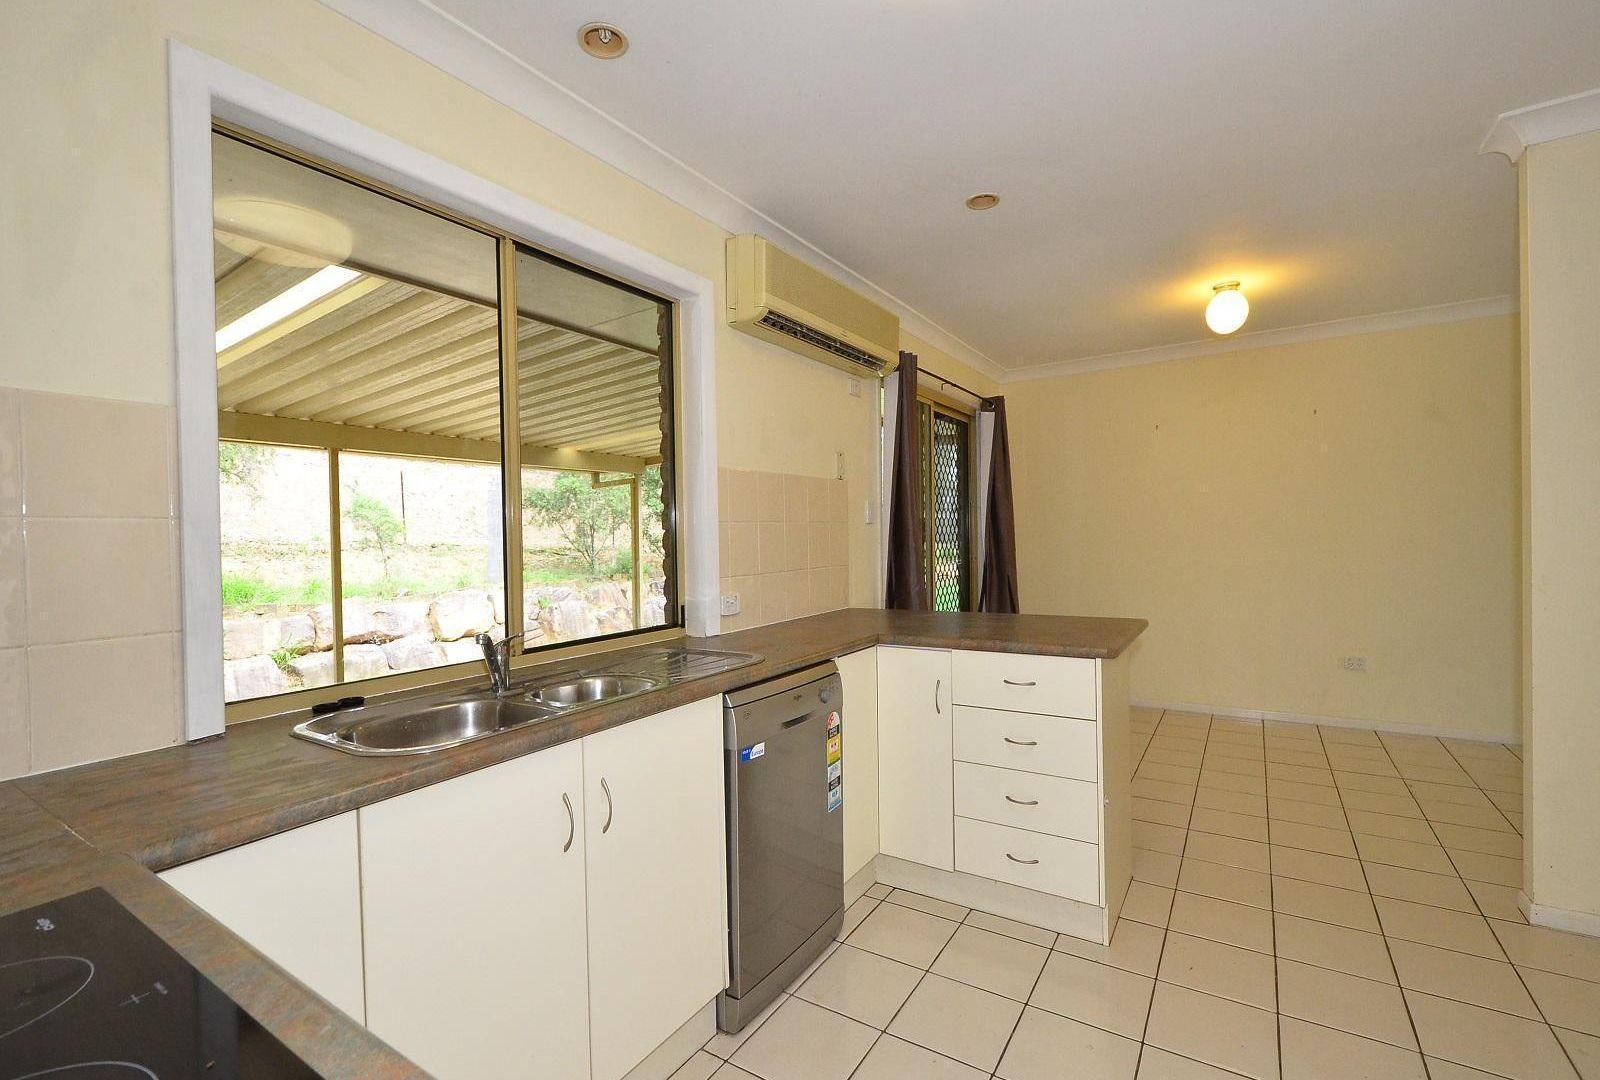 14 Squires Road, Lockyer QLD 4344, Image 1